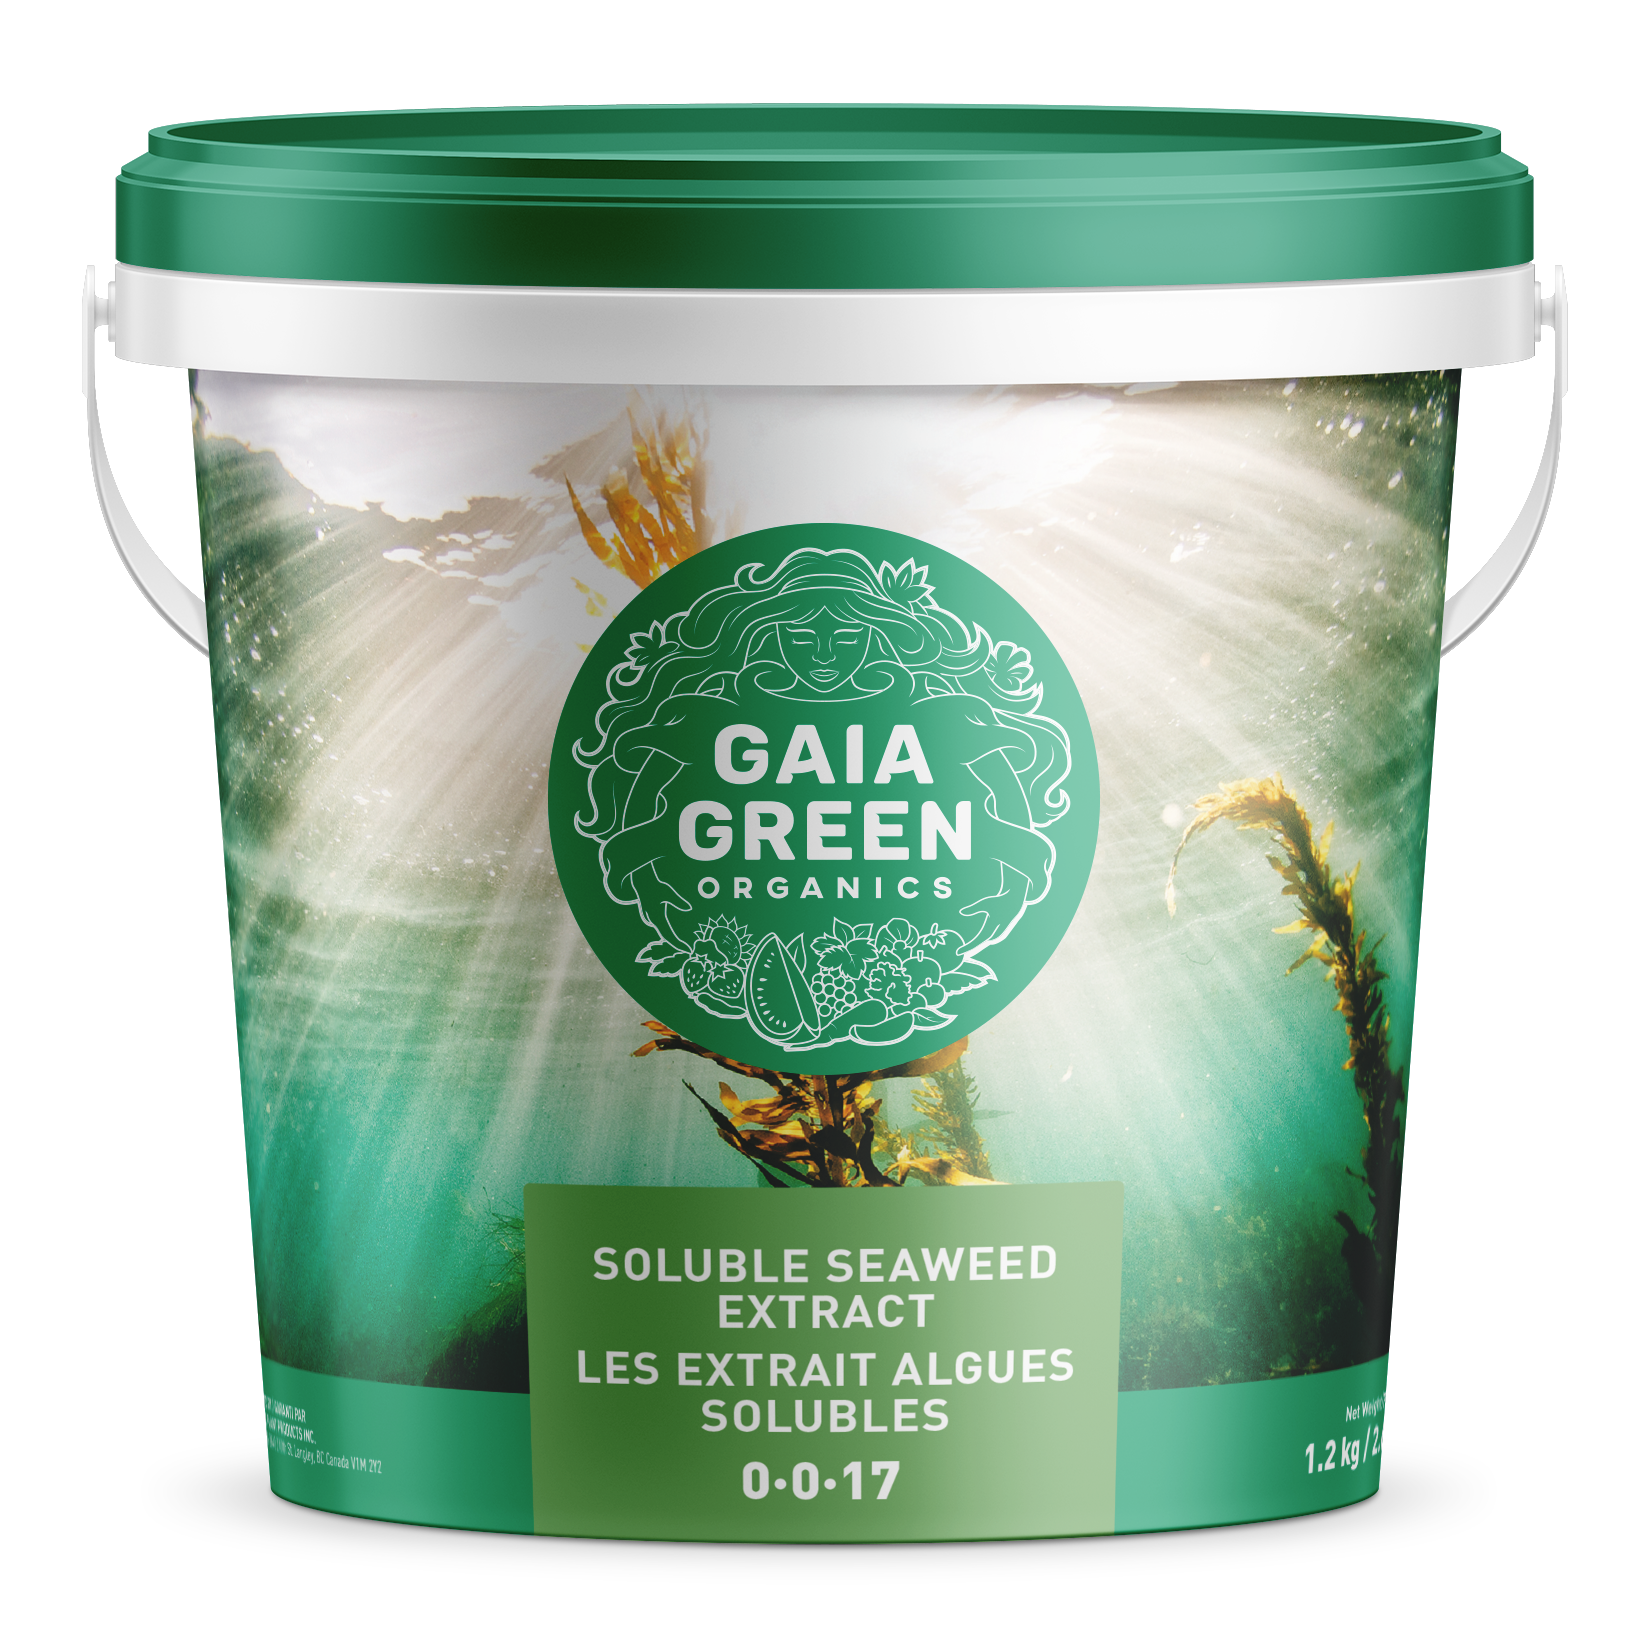 Gaia Green Soluble Seaweed Extract